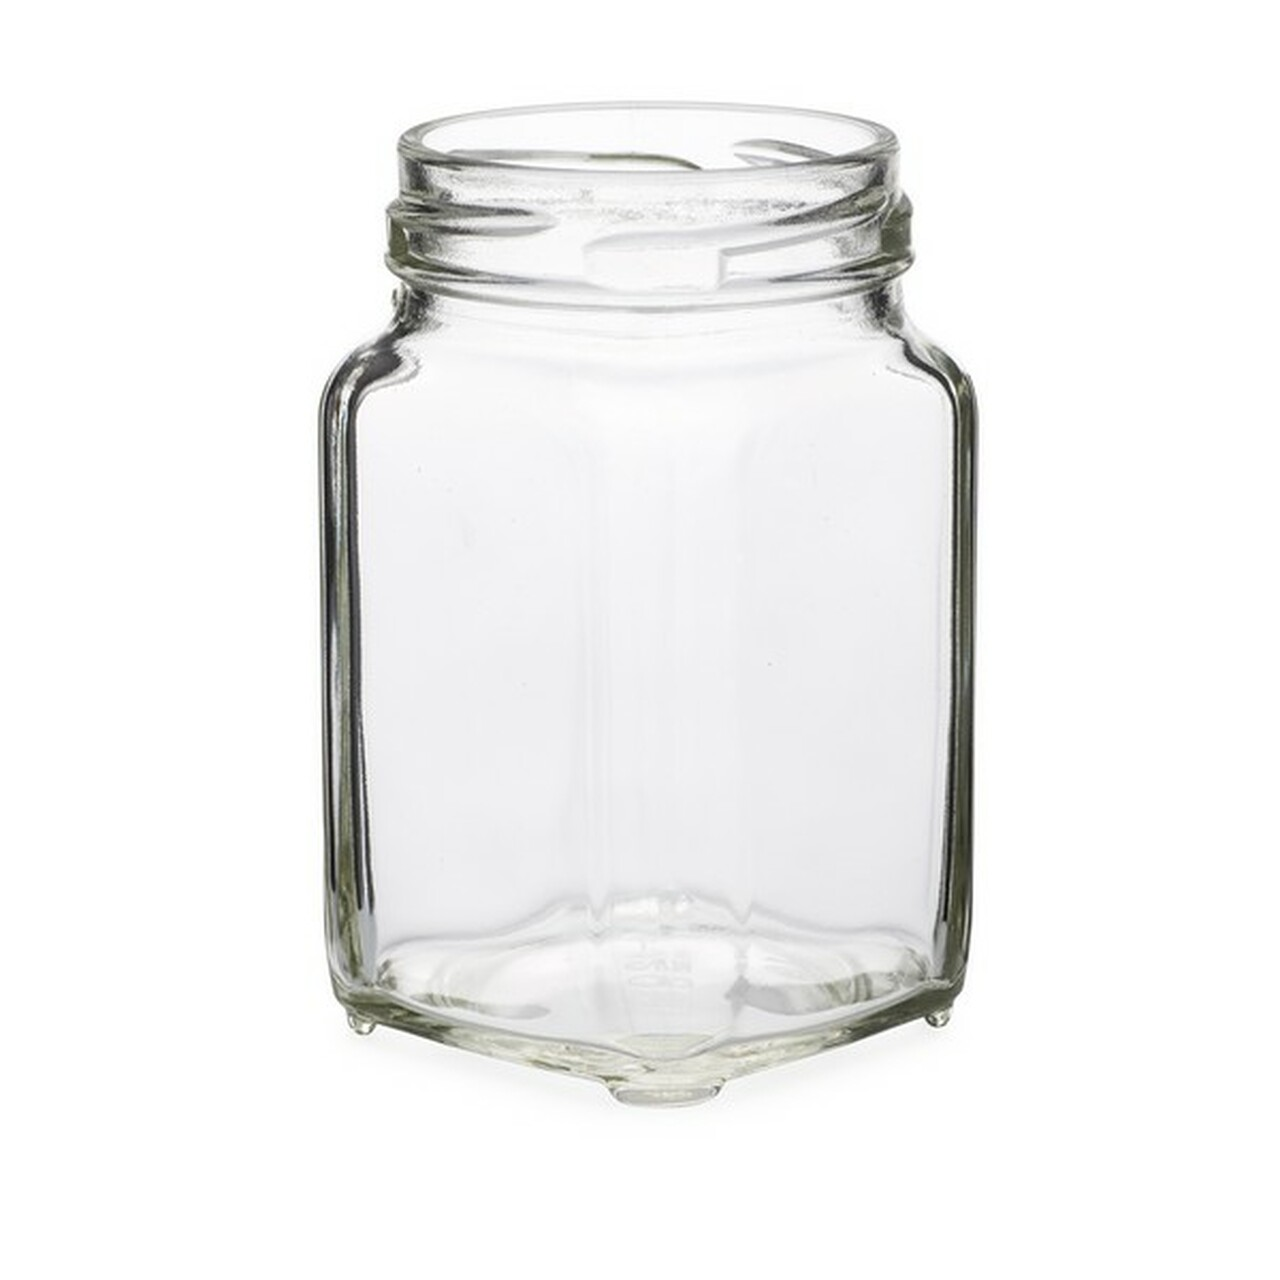 6 3 oz clear glass square jars cap not included berlin. Black Bedroom Furniture Sets. Home Design Ideas